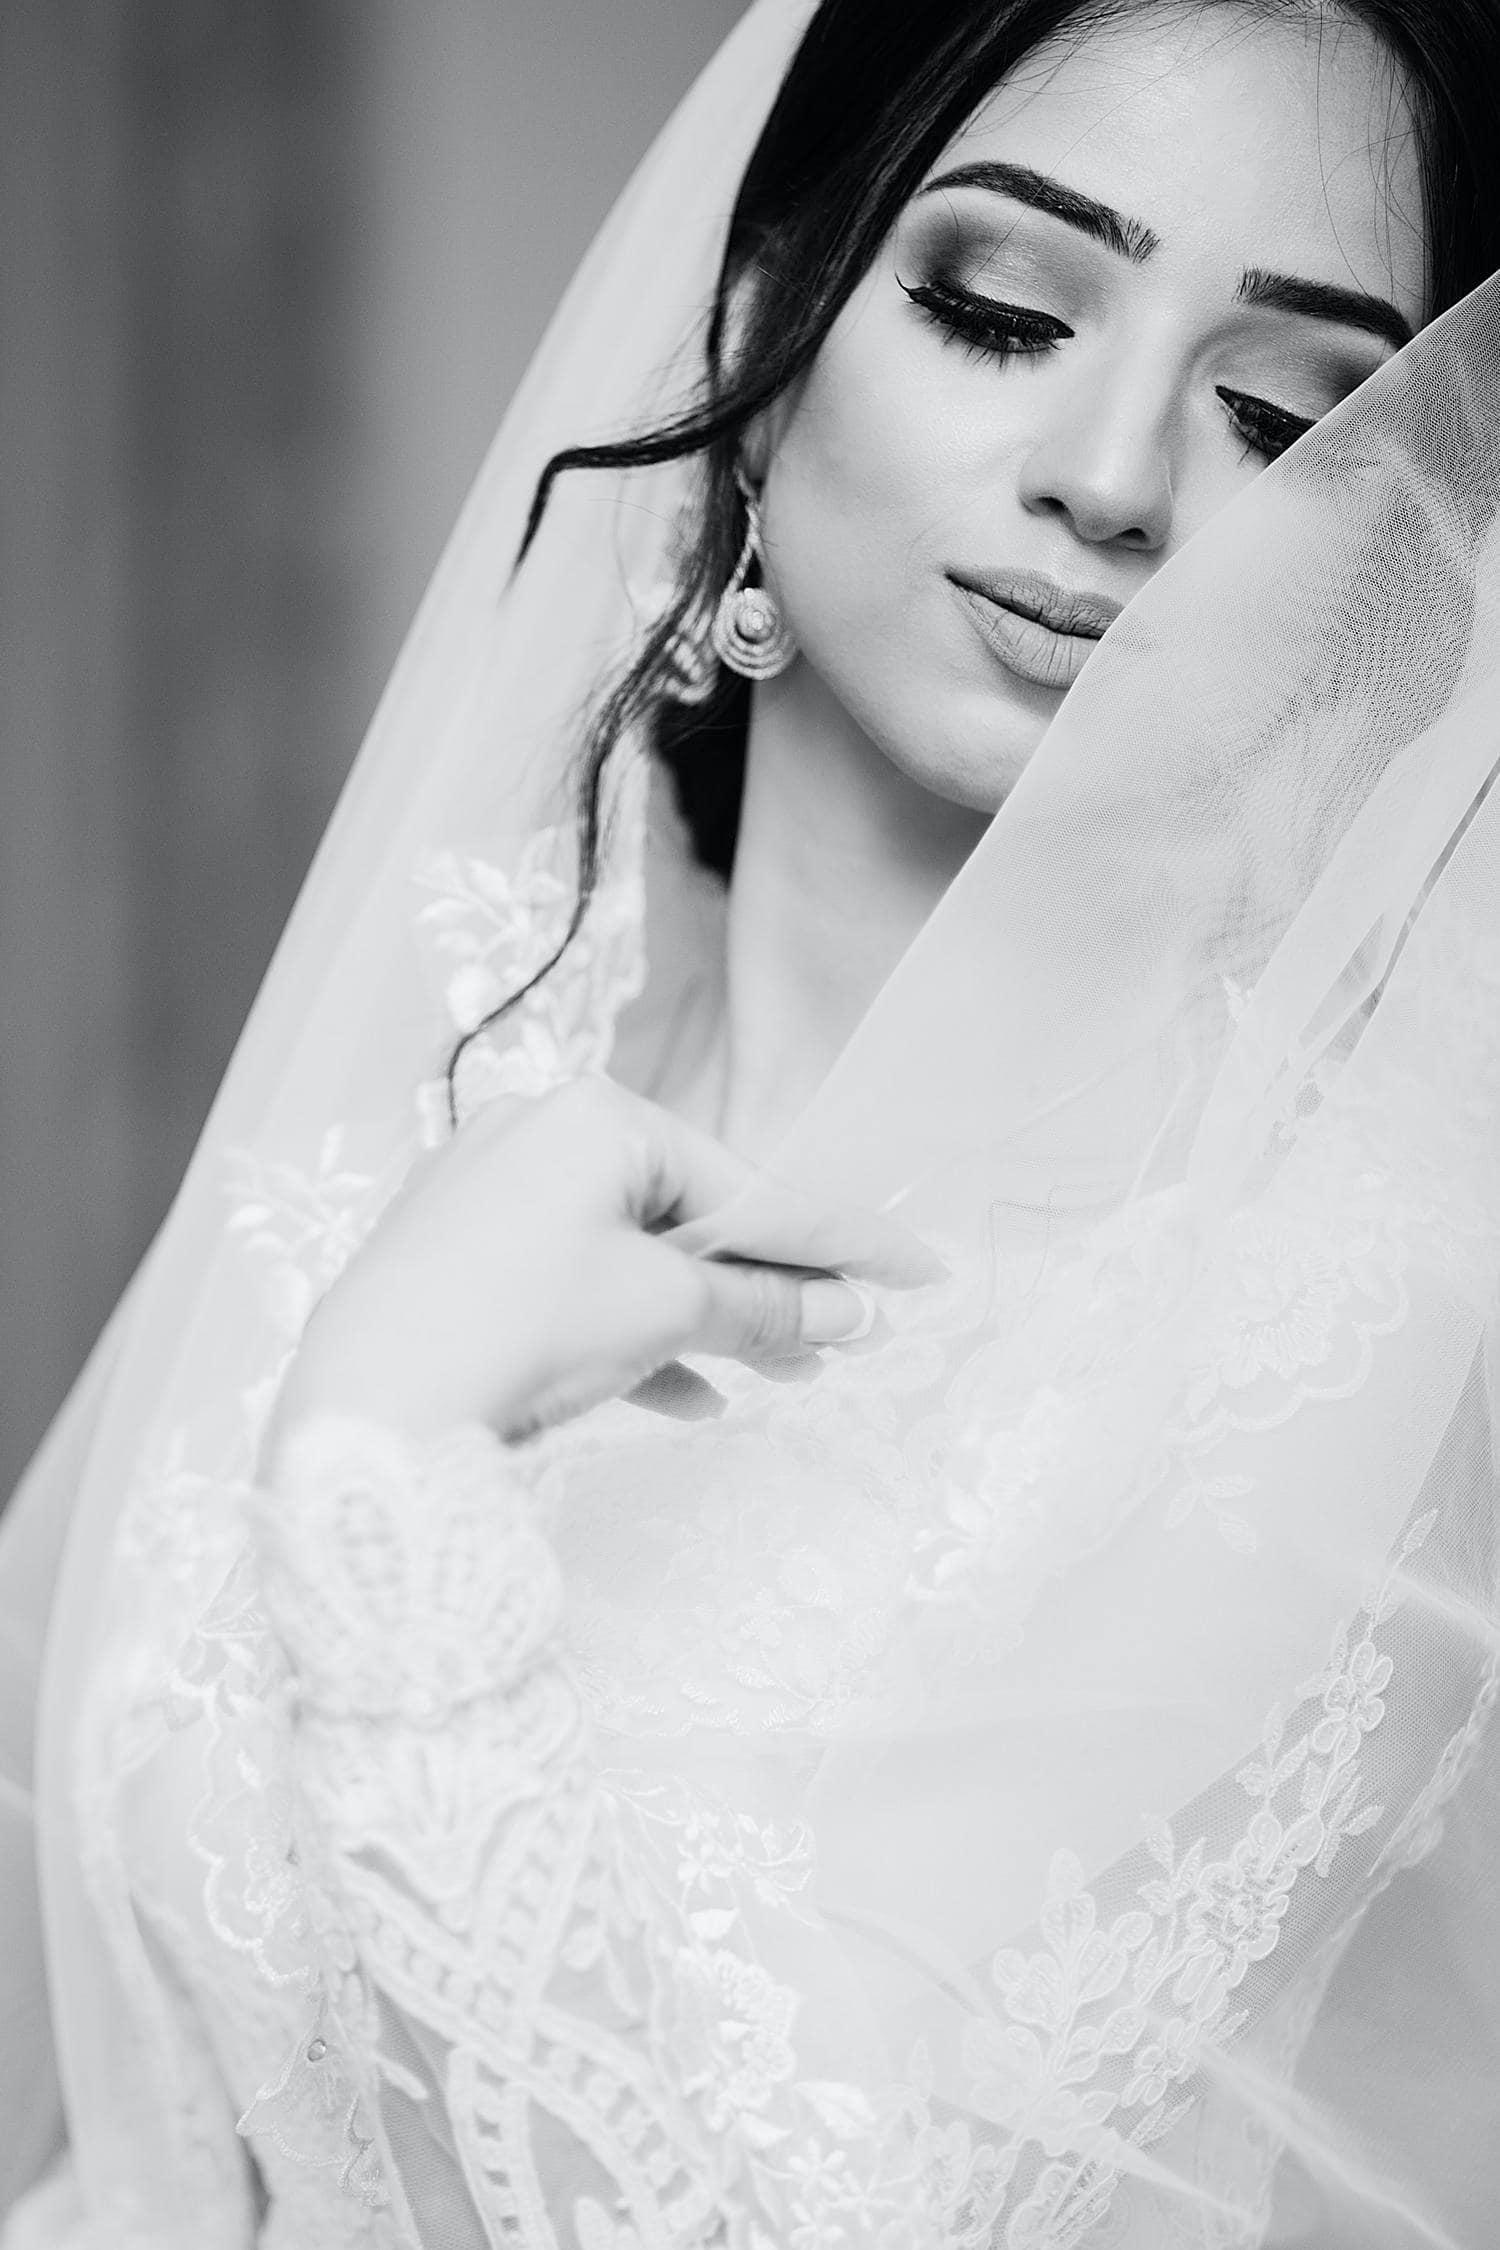 Retrato de novia fotografiado con un objetivo 85mm